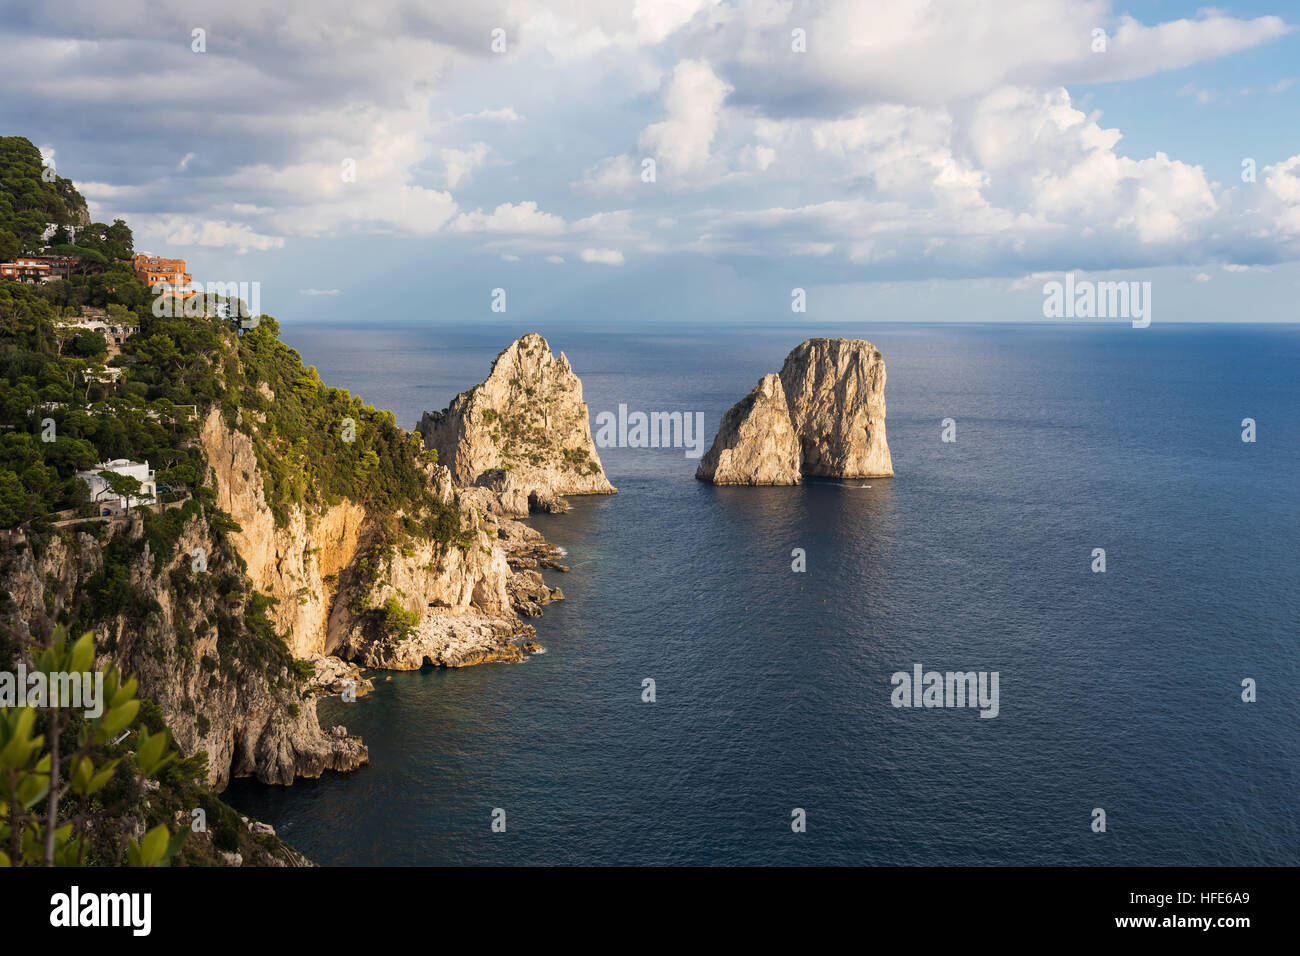 Faraglioni - three famous rocks, Capri, Italy - Stock Image